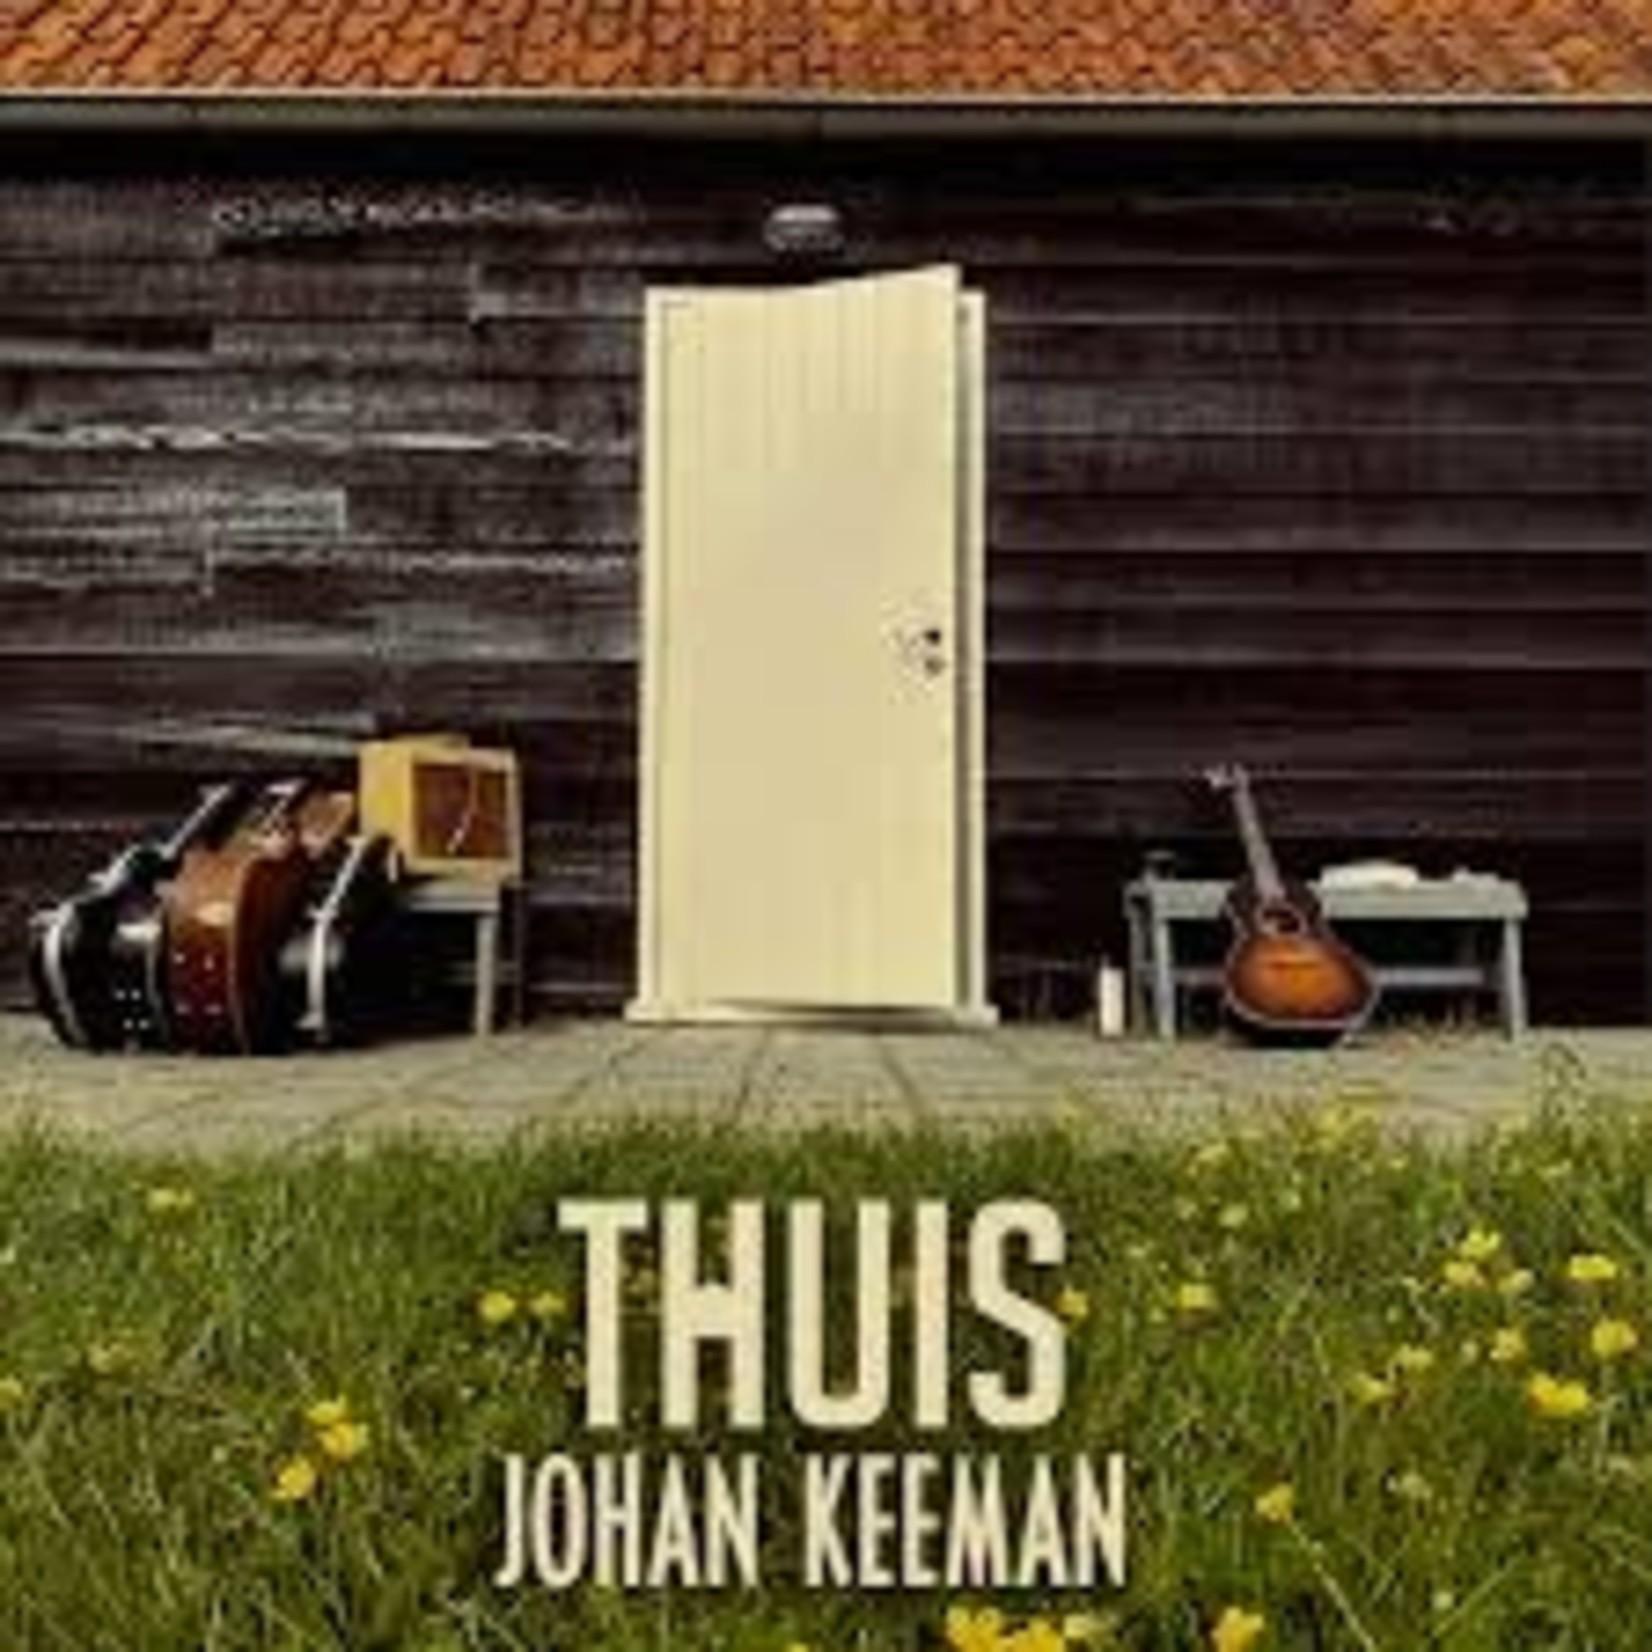 JOHAN_KEEMAN - Thuis  (CD)